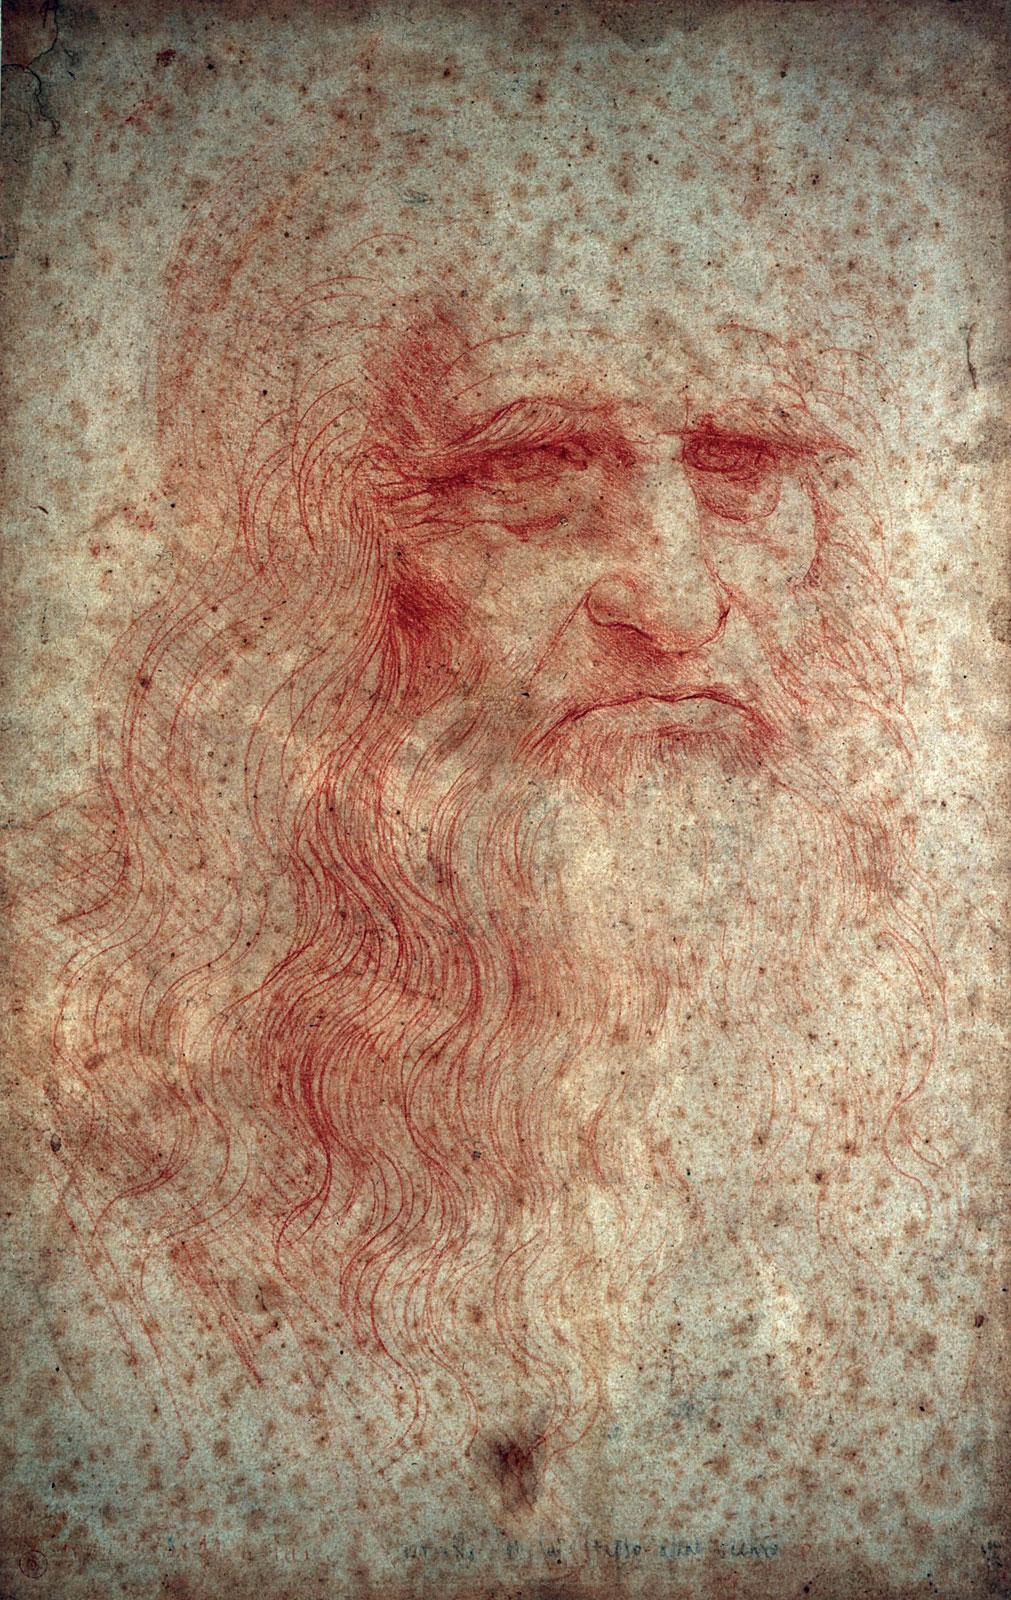 Leonardo da Vinci: Between Art and Science (NEH Summer Institute, Florence Italy 2012), edited by Francesca Fiorani and Anna Marazeula Kim (March 2014)